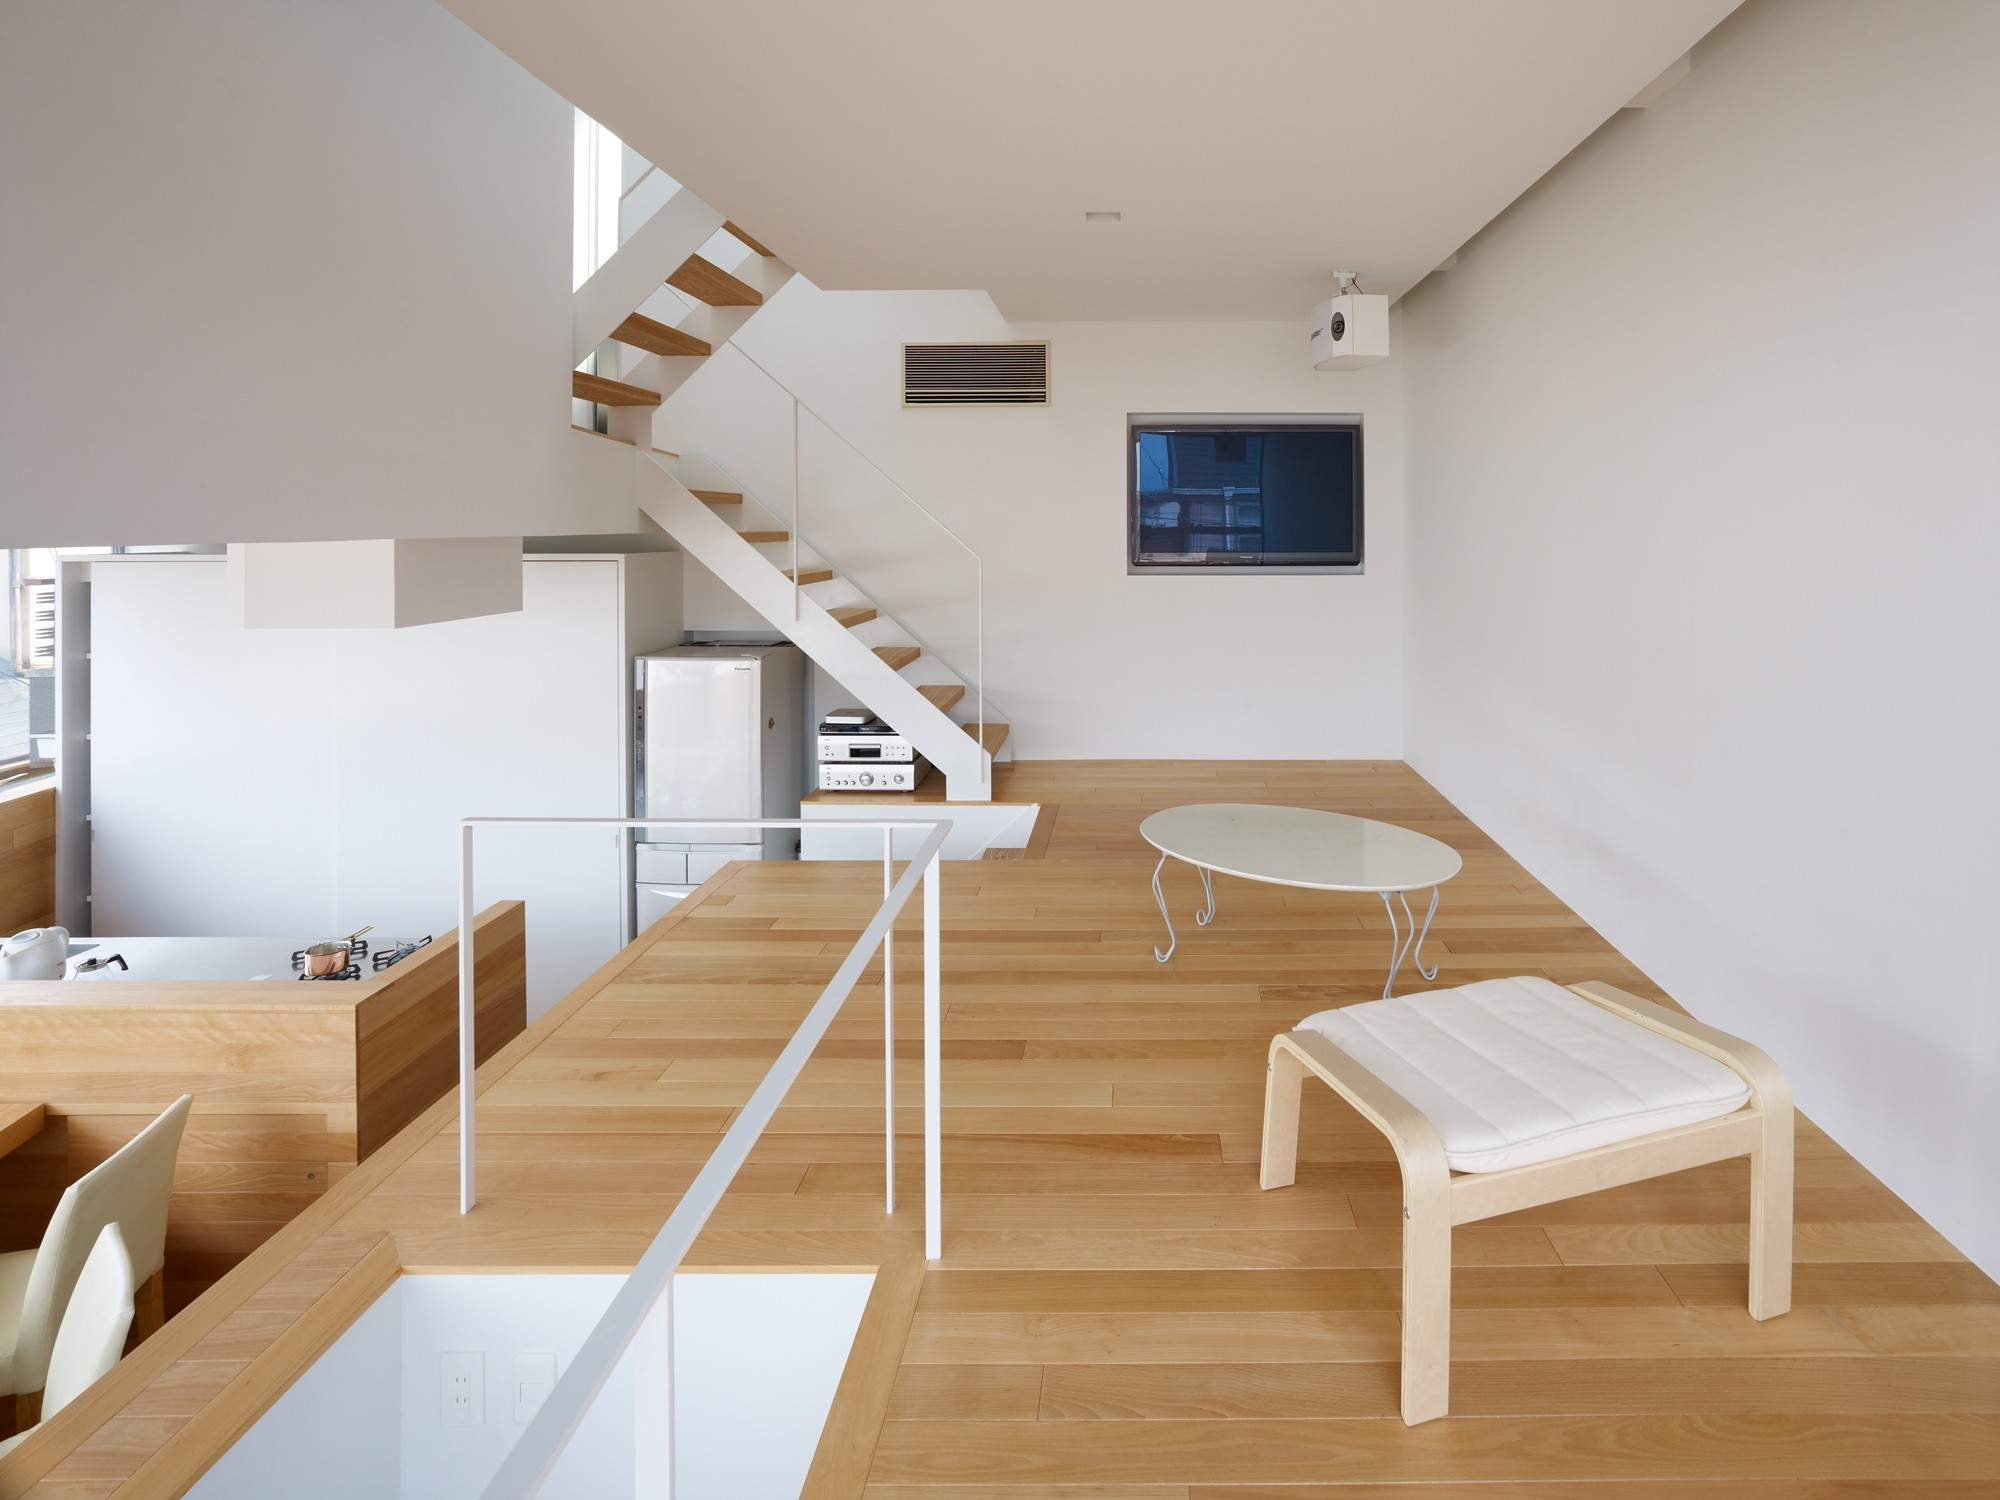 Gallery of house in matubara fujiwaramuro architects 5 for Minimalist cabin design